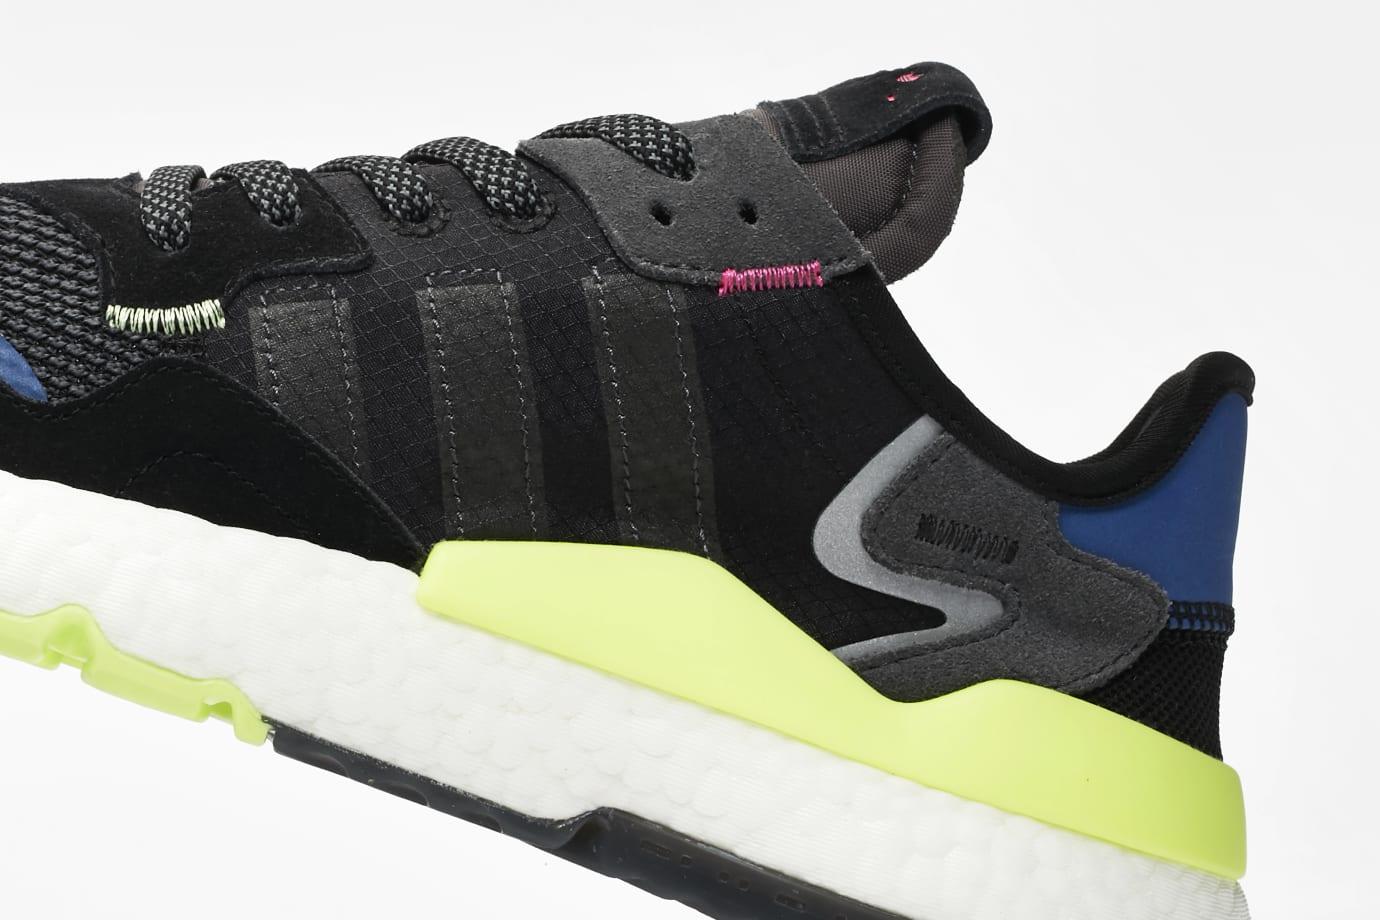 SNS x Adidas Nite Jogger 'Black/Carbon-Grey Six' EE9462 (Detail)